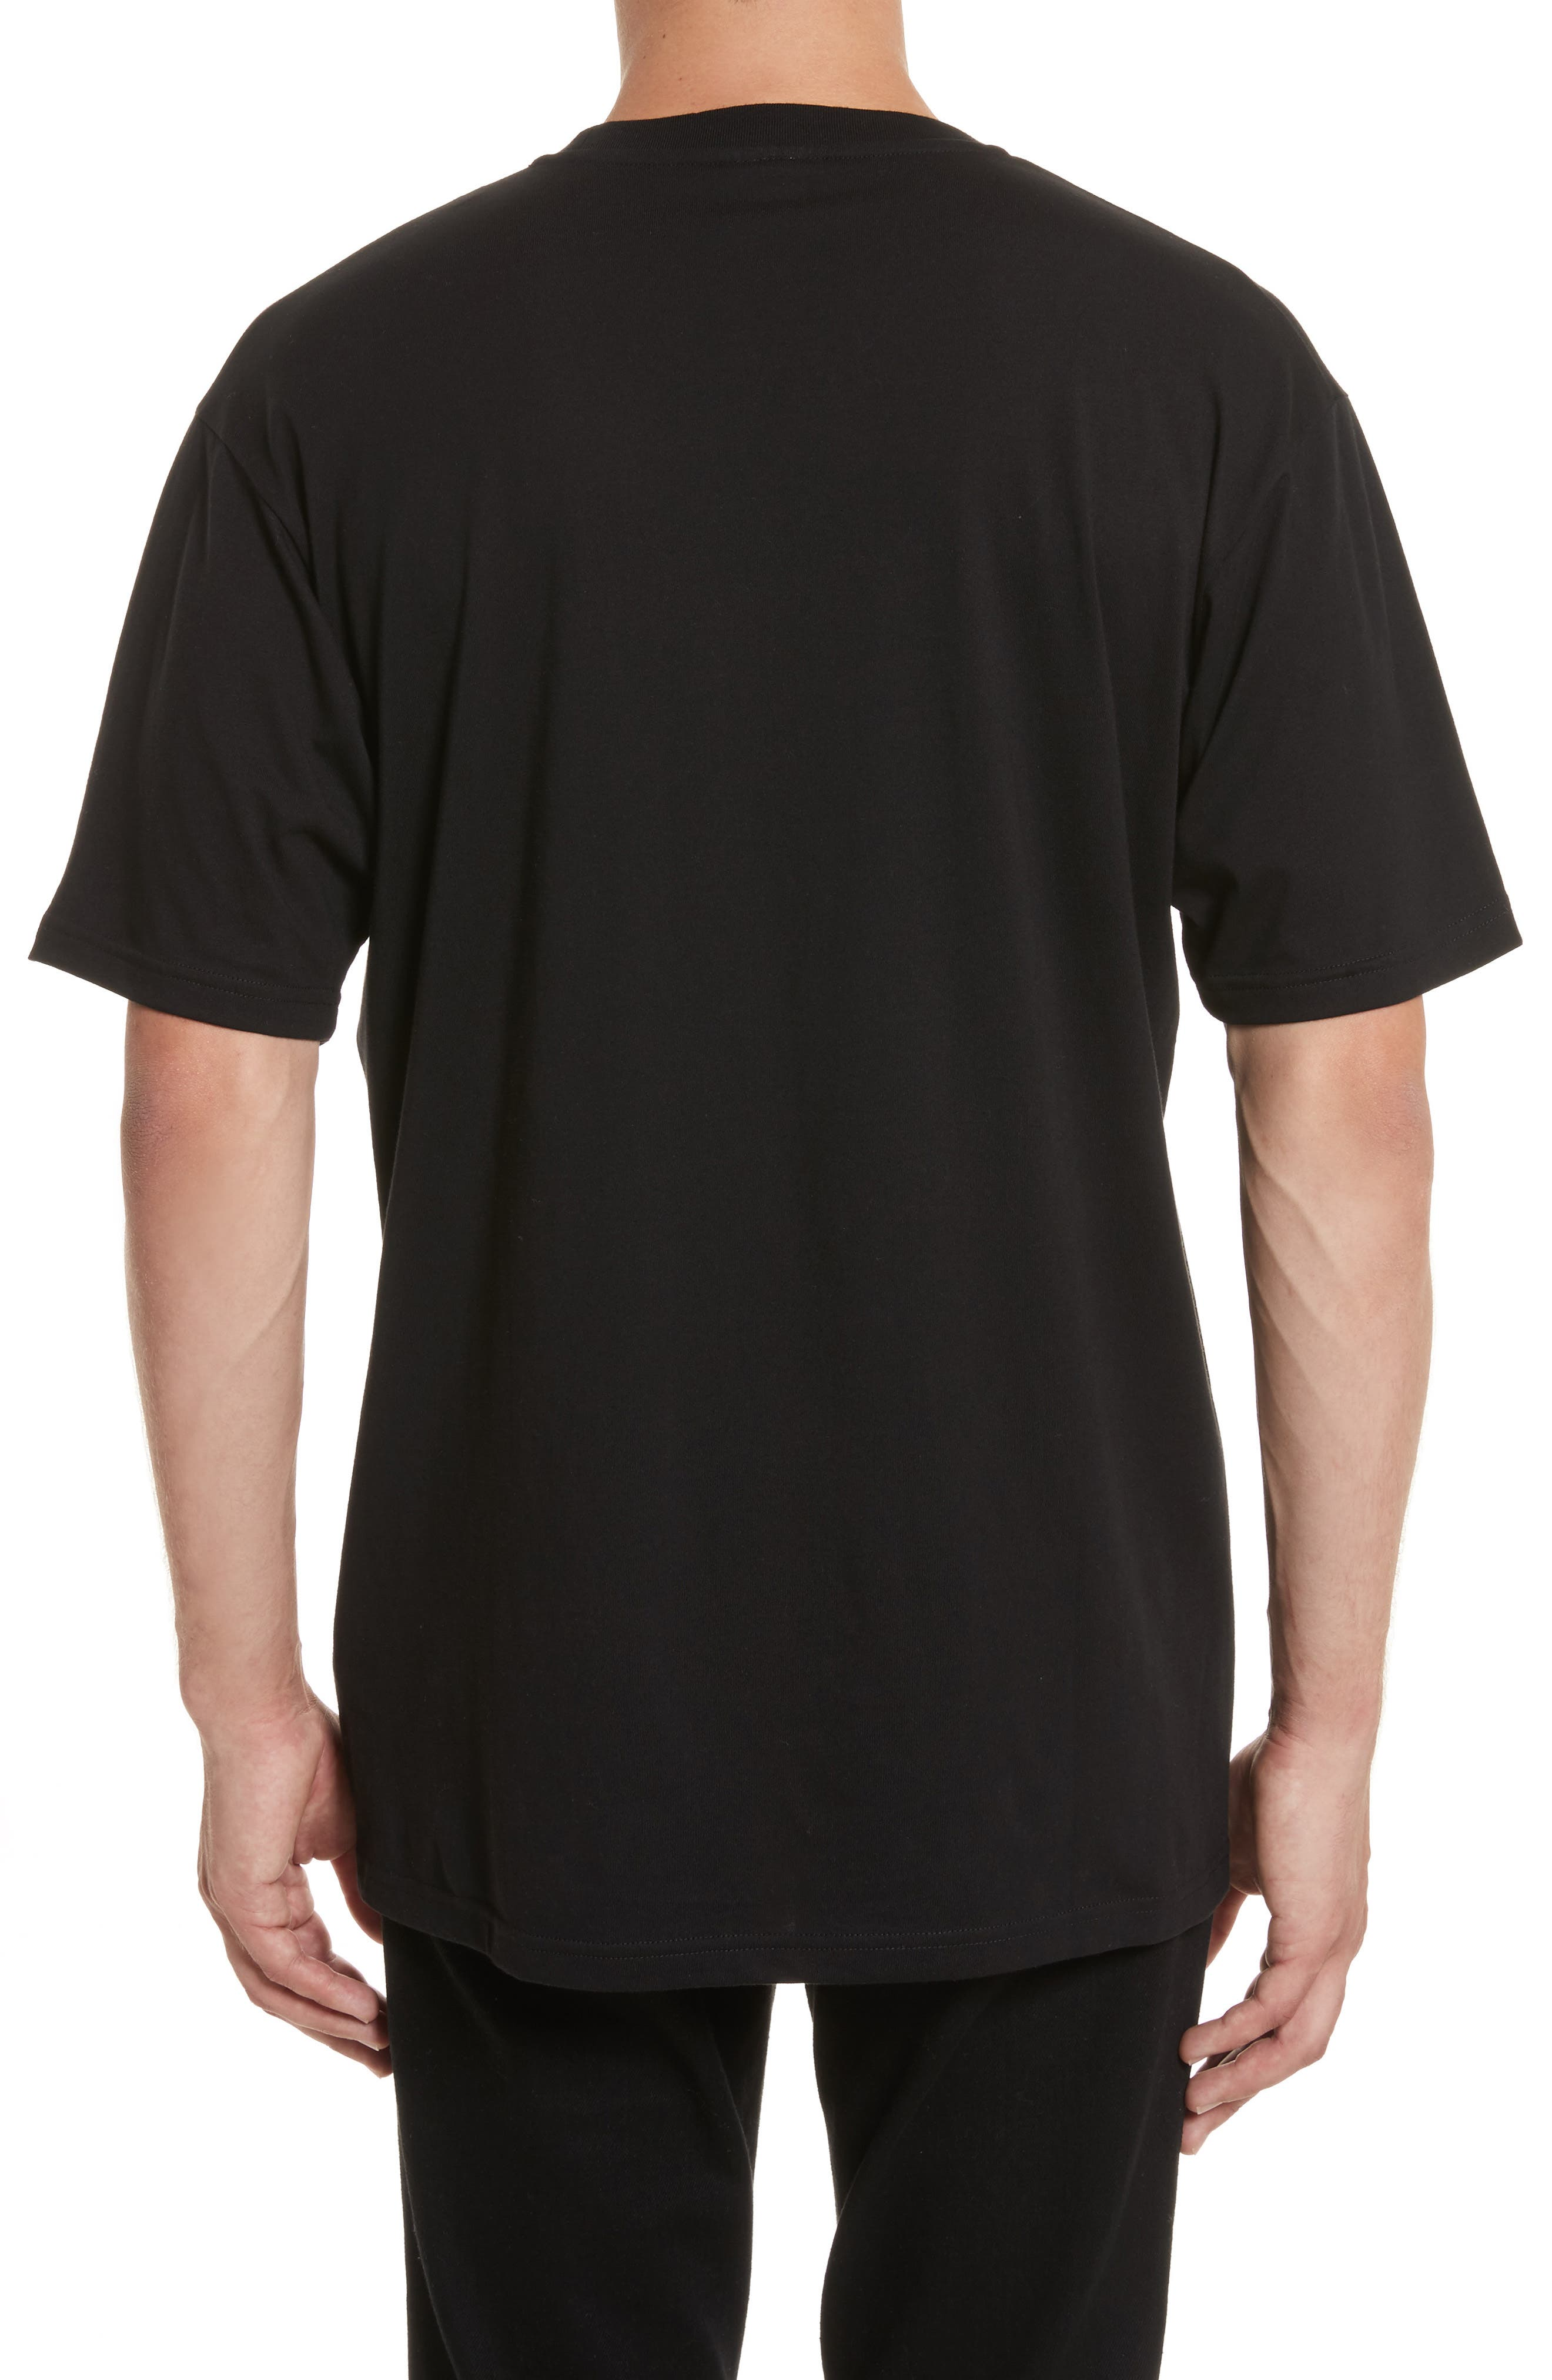 VERSUS by Versace Electric Lion Graphic T-Shirt,                             Alternate thumbnail 2, color,                             005